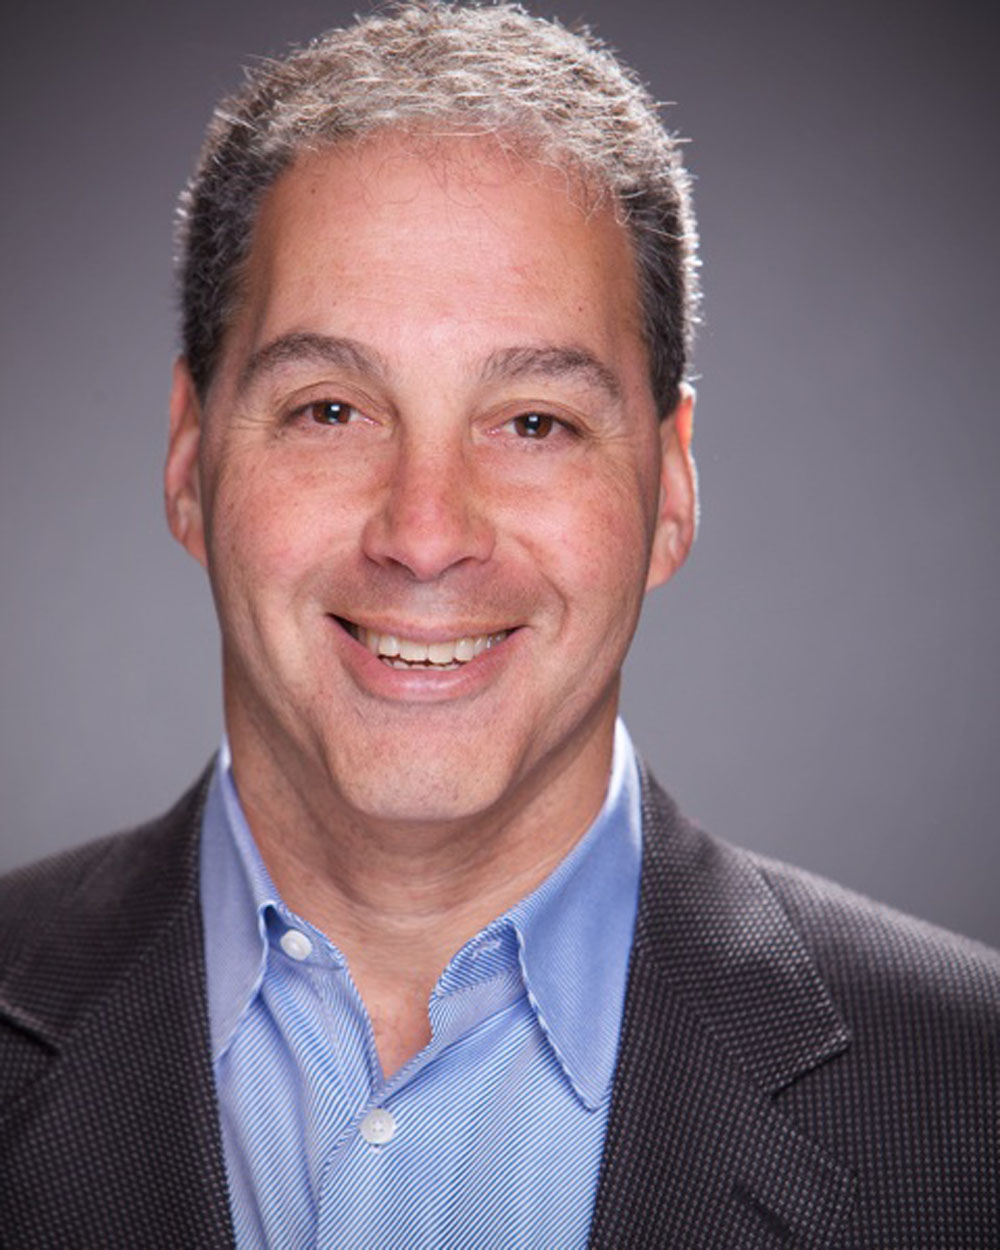 Dan Rosensweig, CEO of Chegg